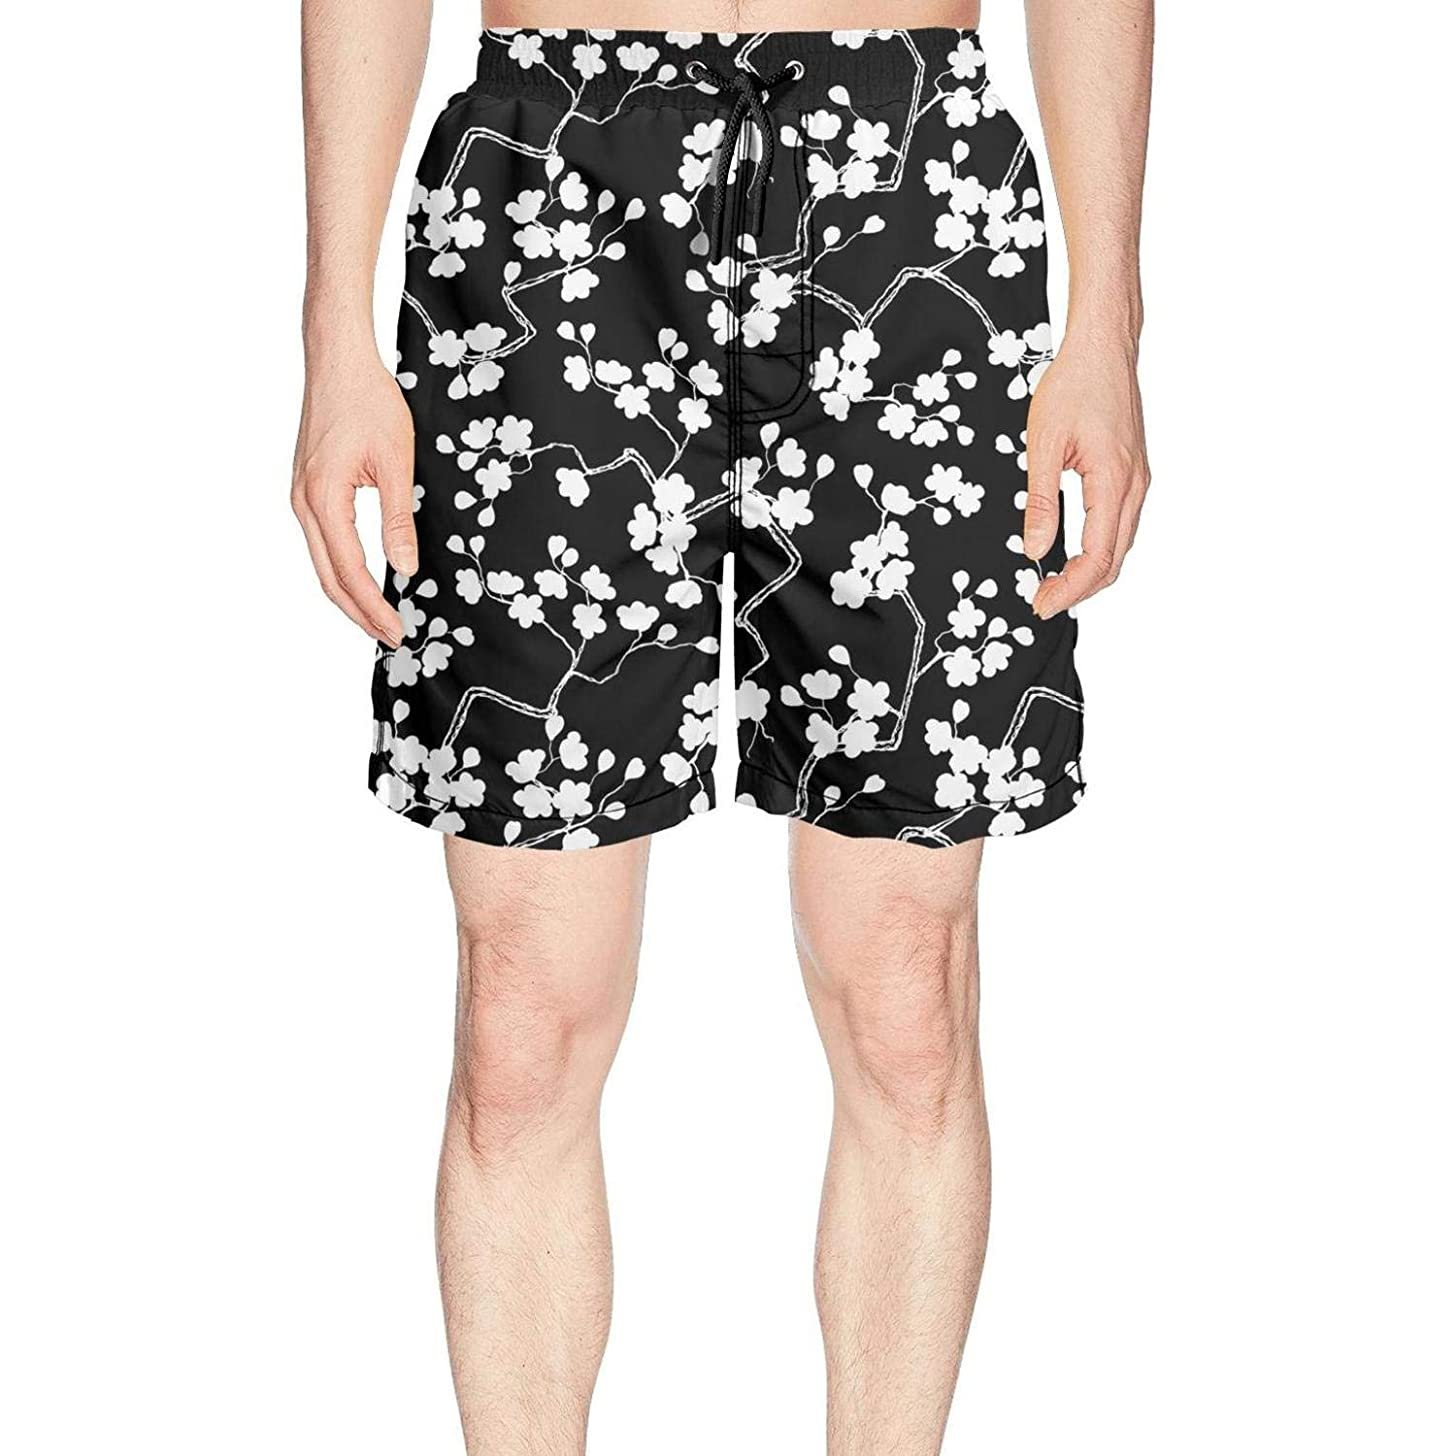 LKIMNJ Mens Print Boardshorts Spring Natural Flowers Quick Dry Comfortable Pockets Mesh Lining